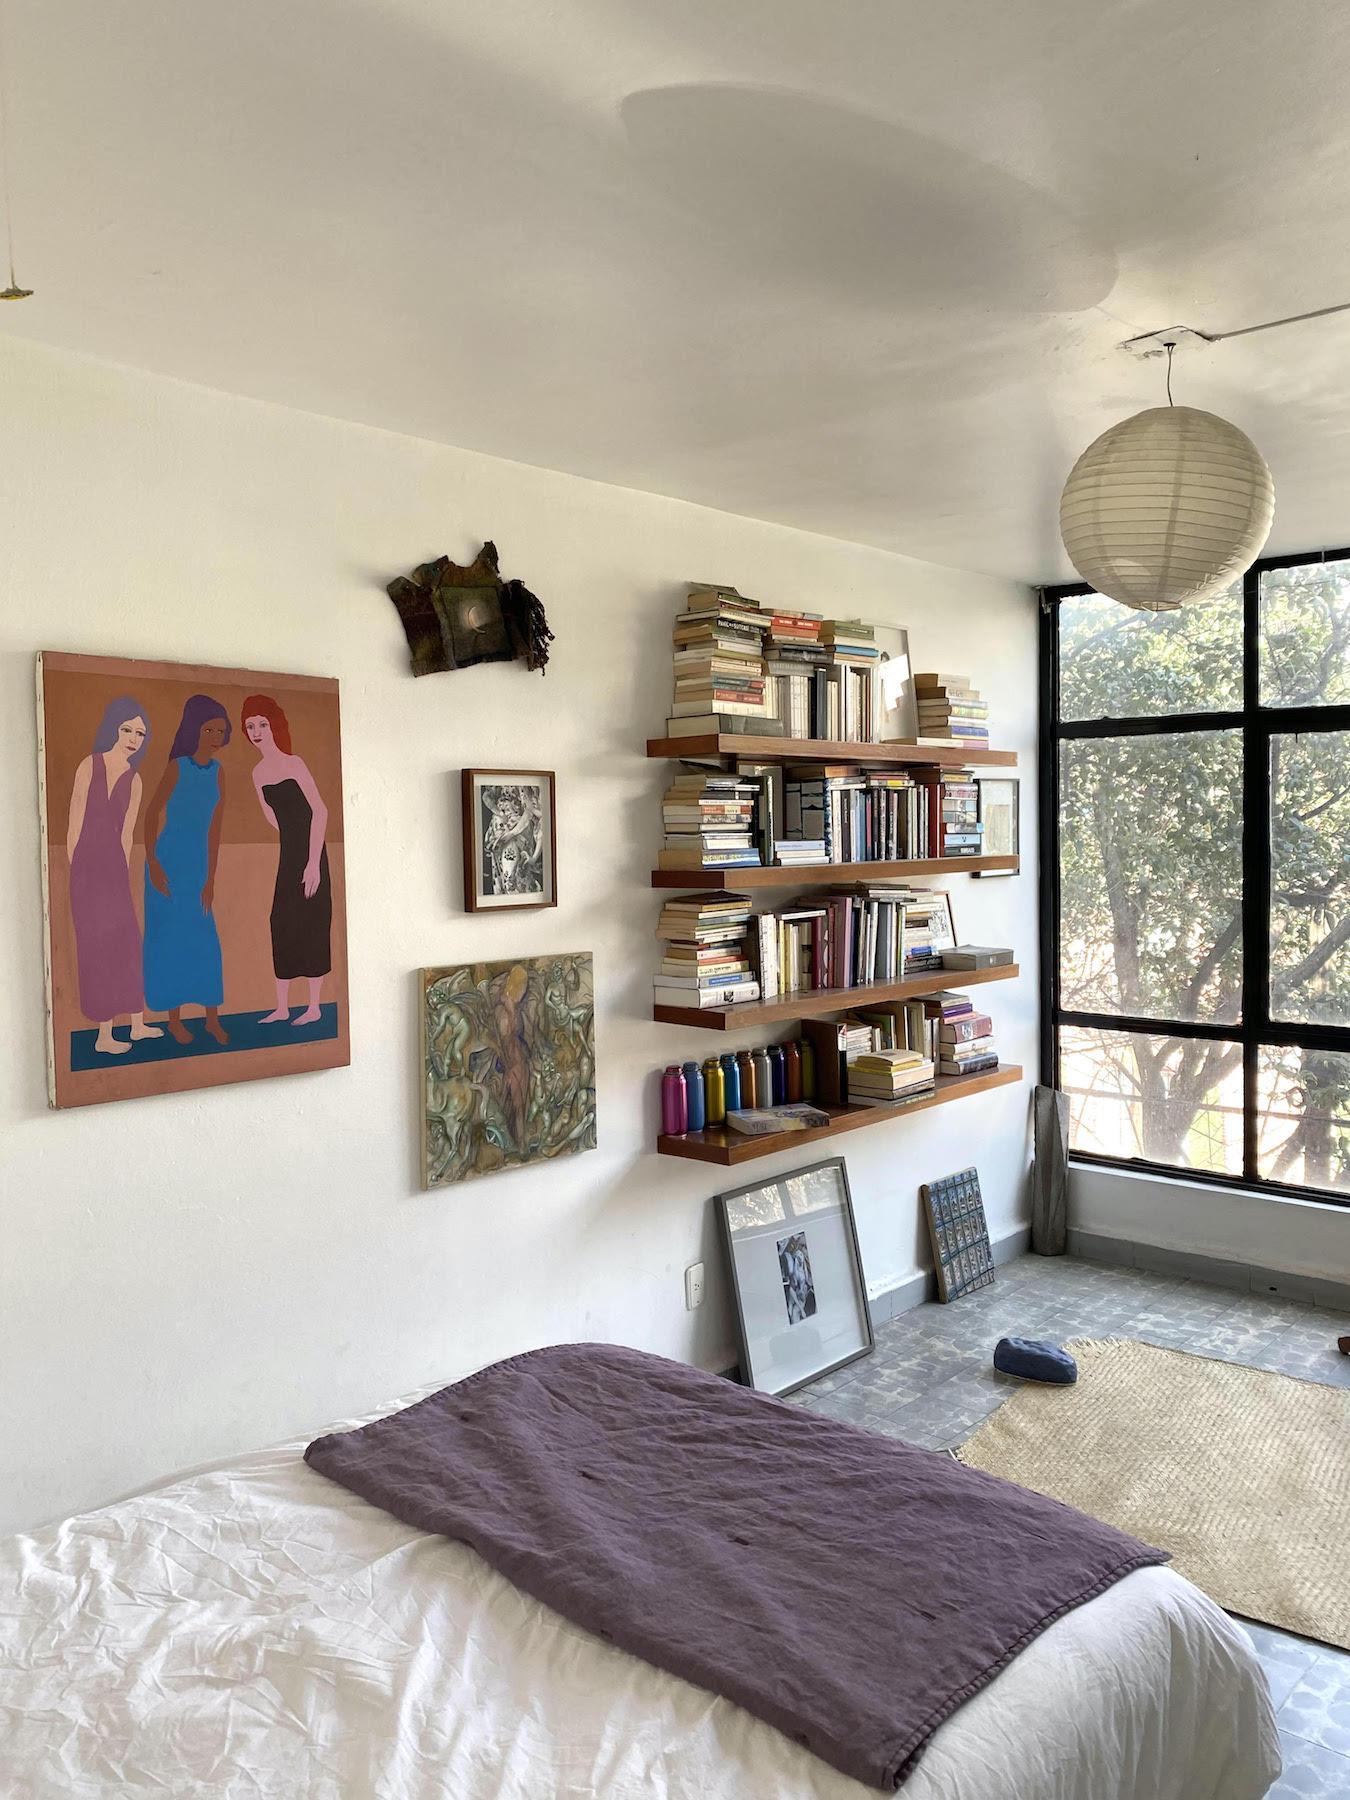 In the bedroom: works by Dora Lipschitz, Santiago de Paoli, Jochen Lempert, Jannis Marwitz, Martin Soto Climent, Jennifer J. Lee, Michael Dean, among others. Courtesy of Chris Sharp.